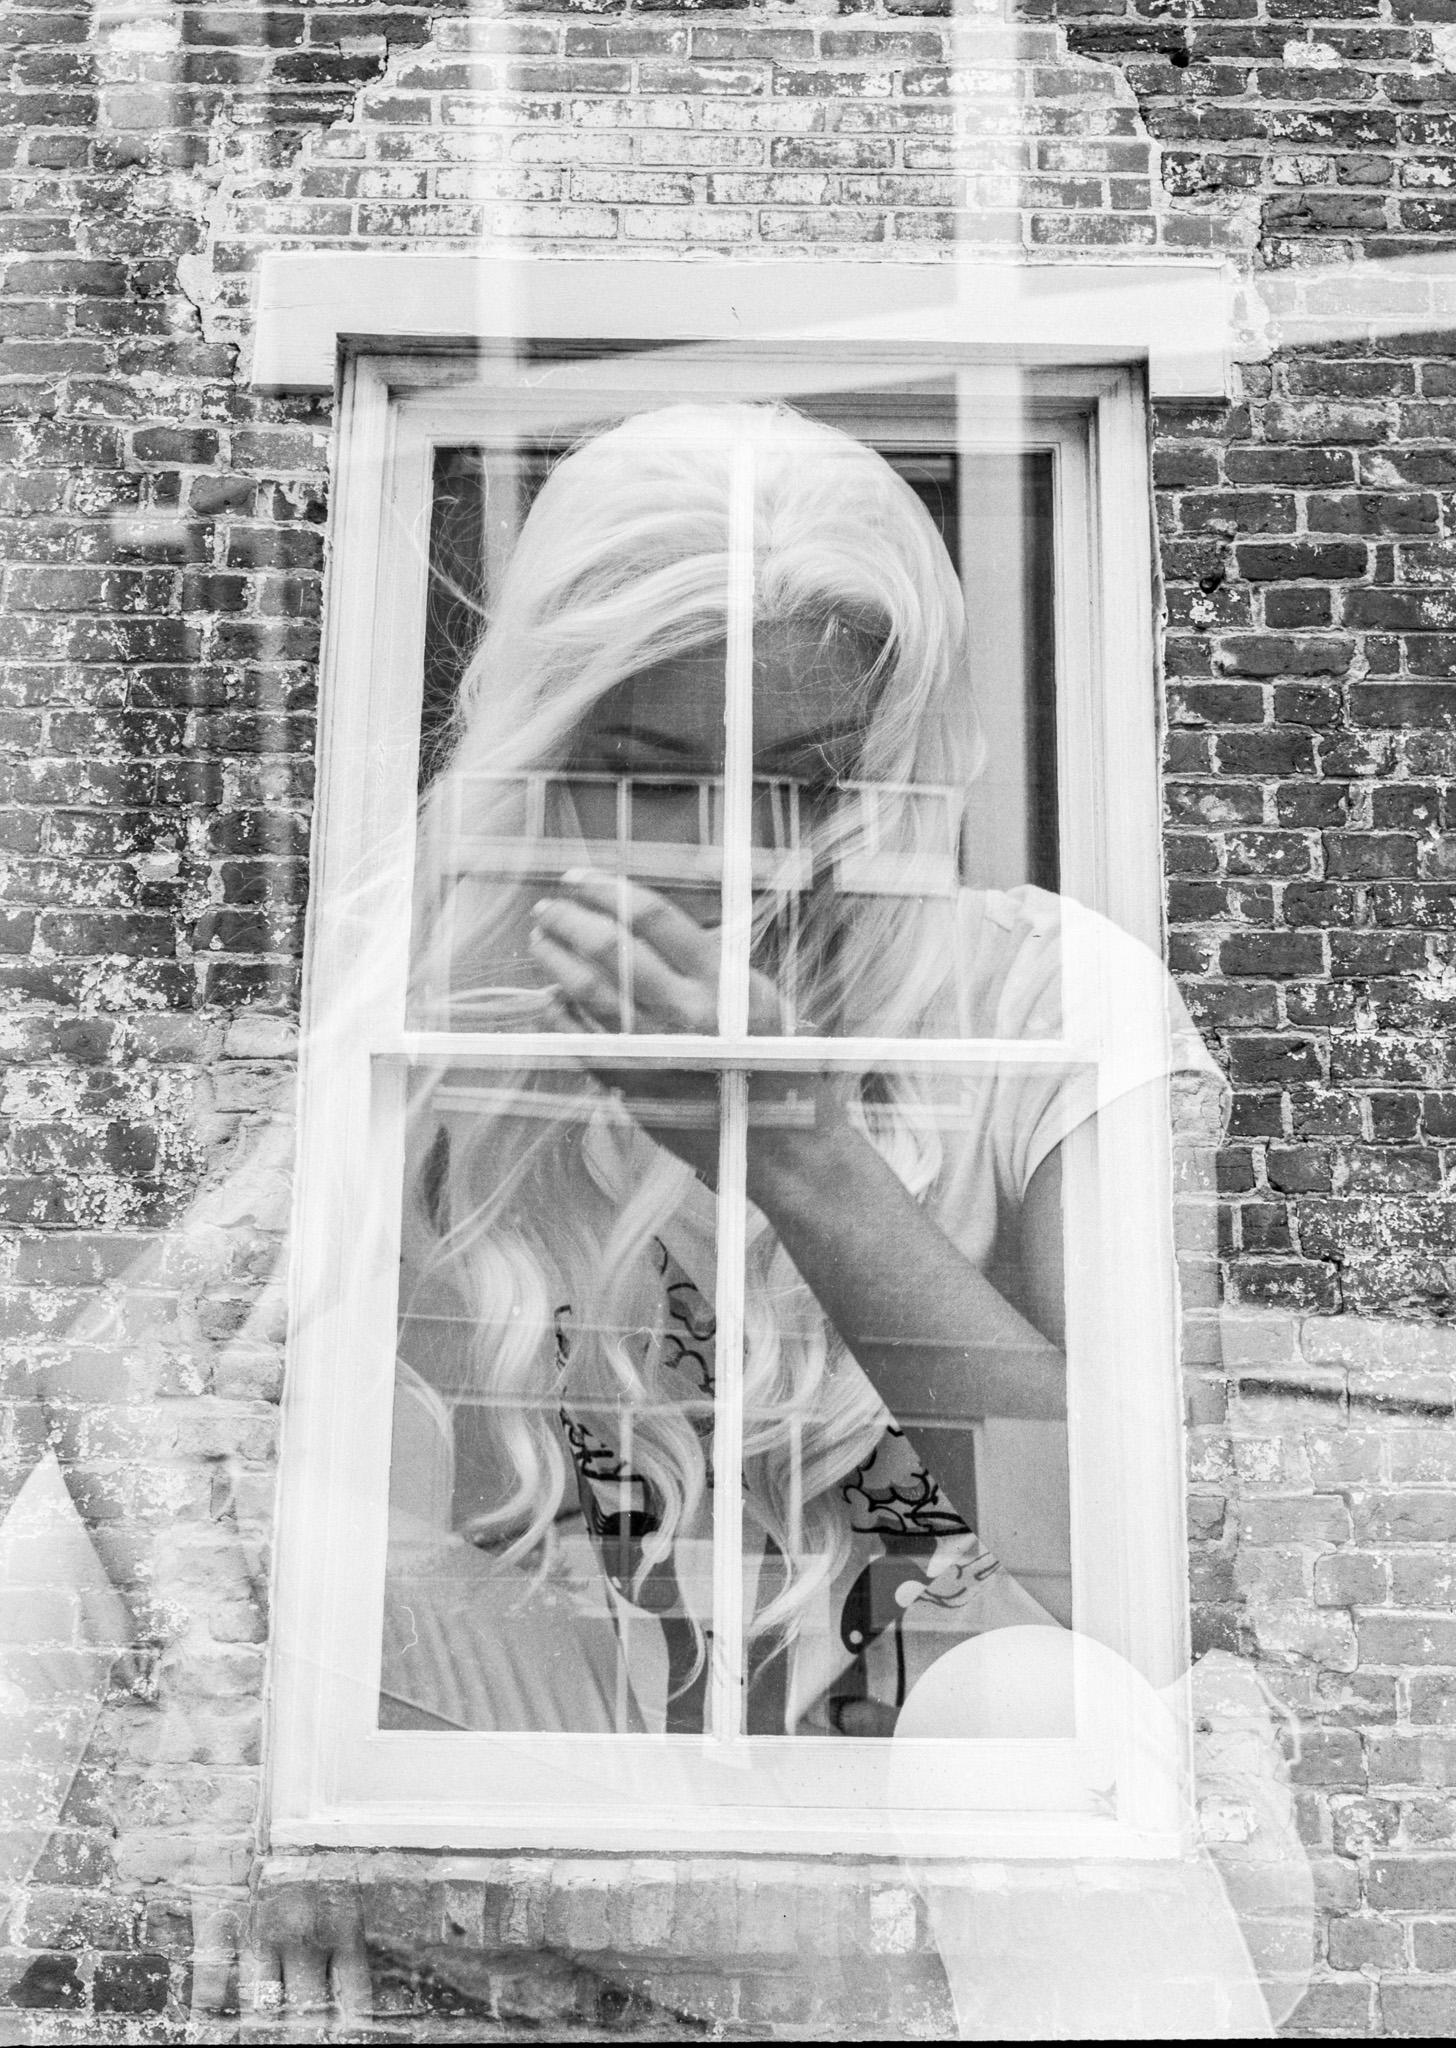 Photographer: Darkroom Portraits  Camera and Film: Mamiya645af and Hp5+  Model:Adoette  © 2016 Darkroom Portraits